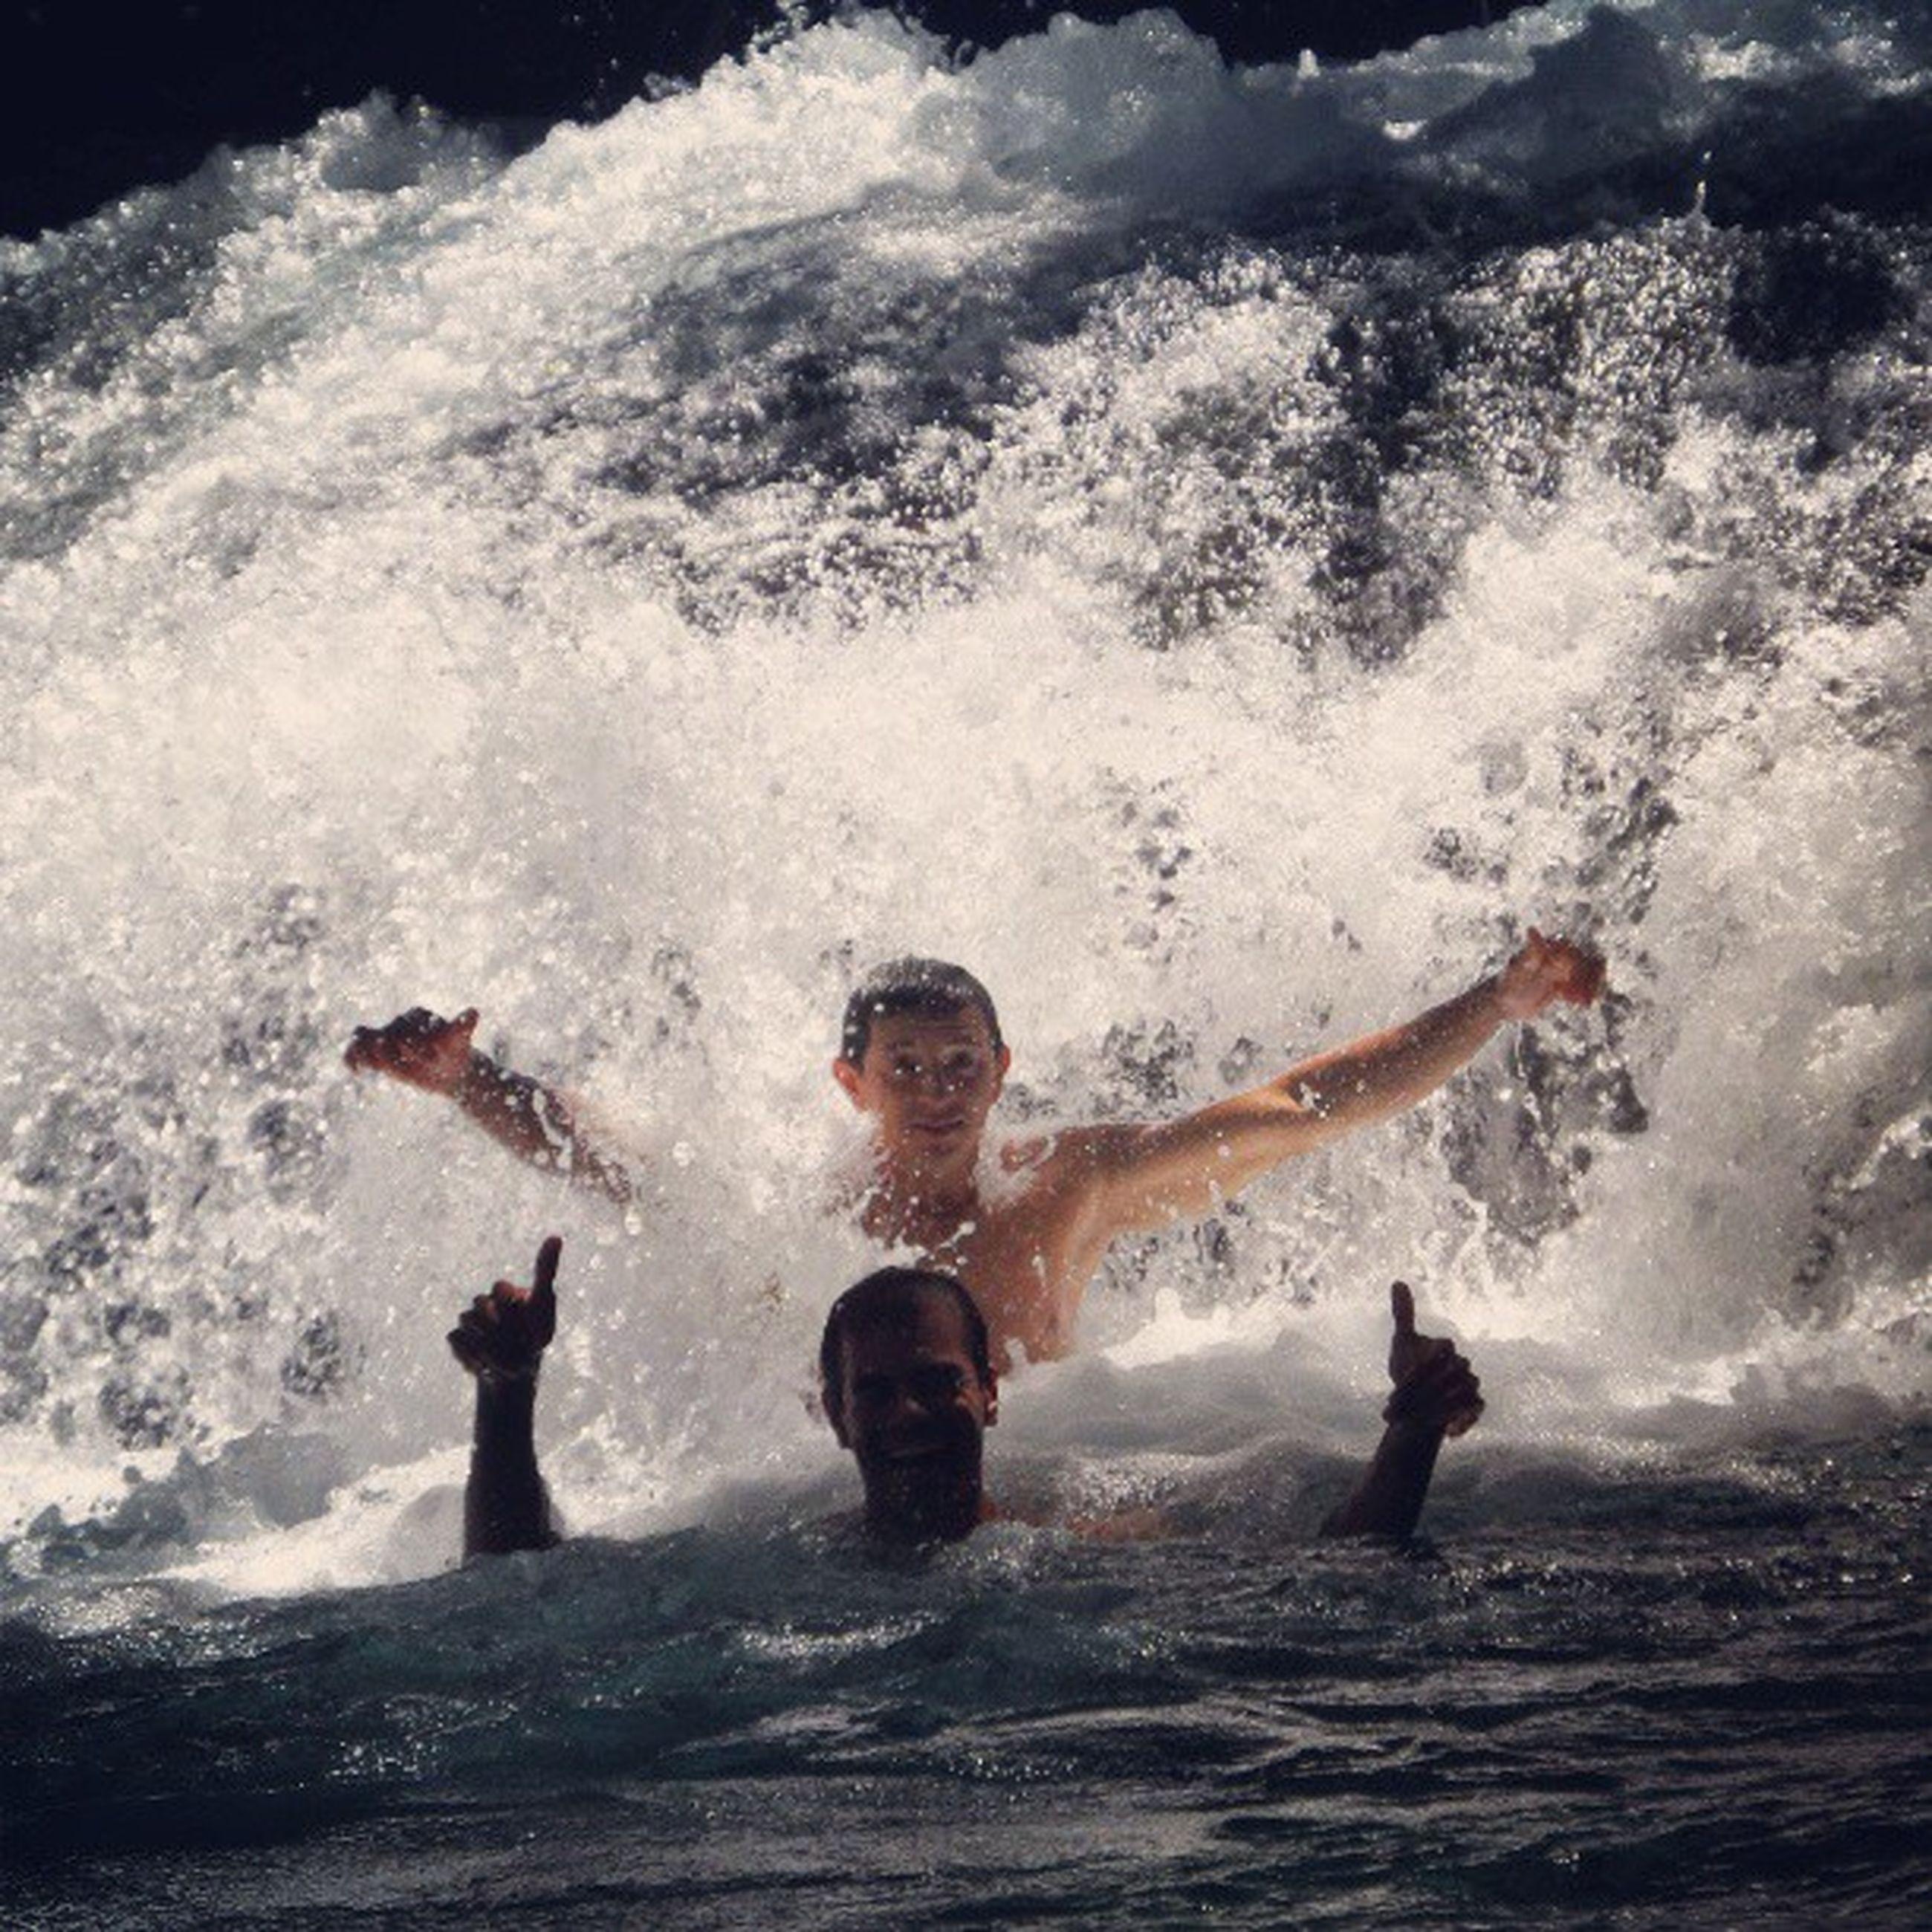 water, leisure activity, lifestyles, motion, splashing, sea, enjoyment, waterfront, vacations, wave, full length, fun, surf, men, sport, adventure, childhood, nature